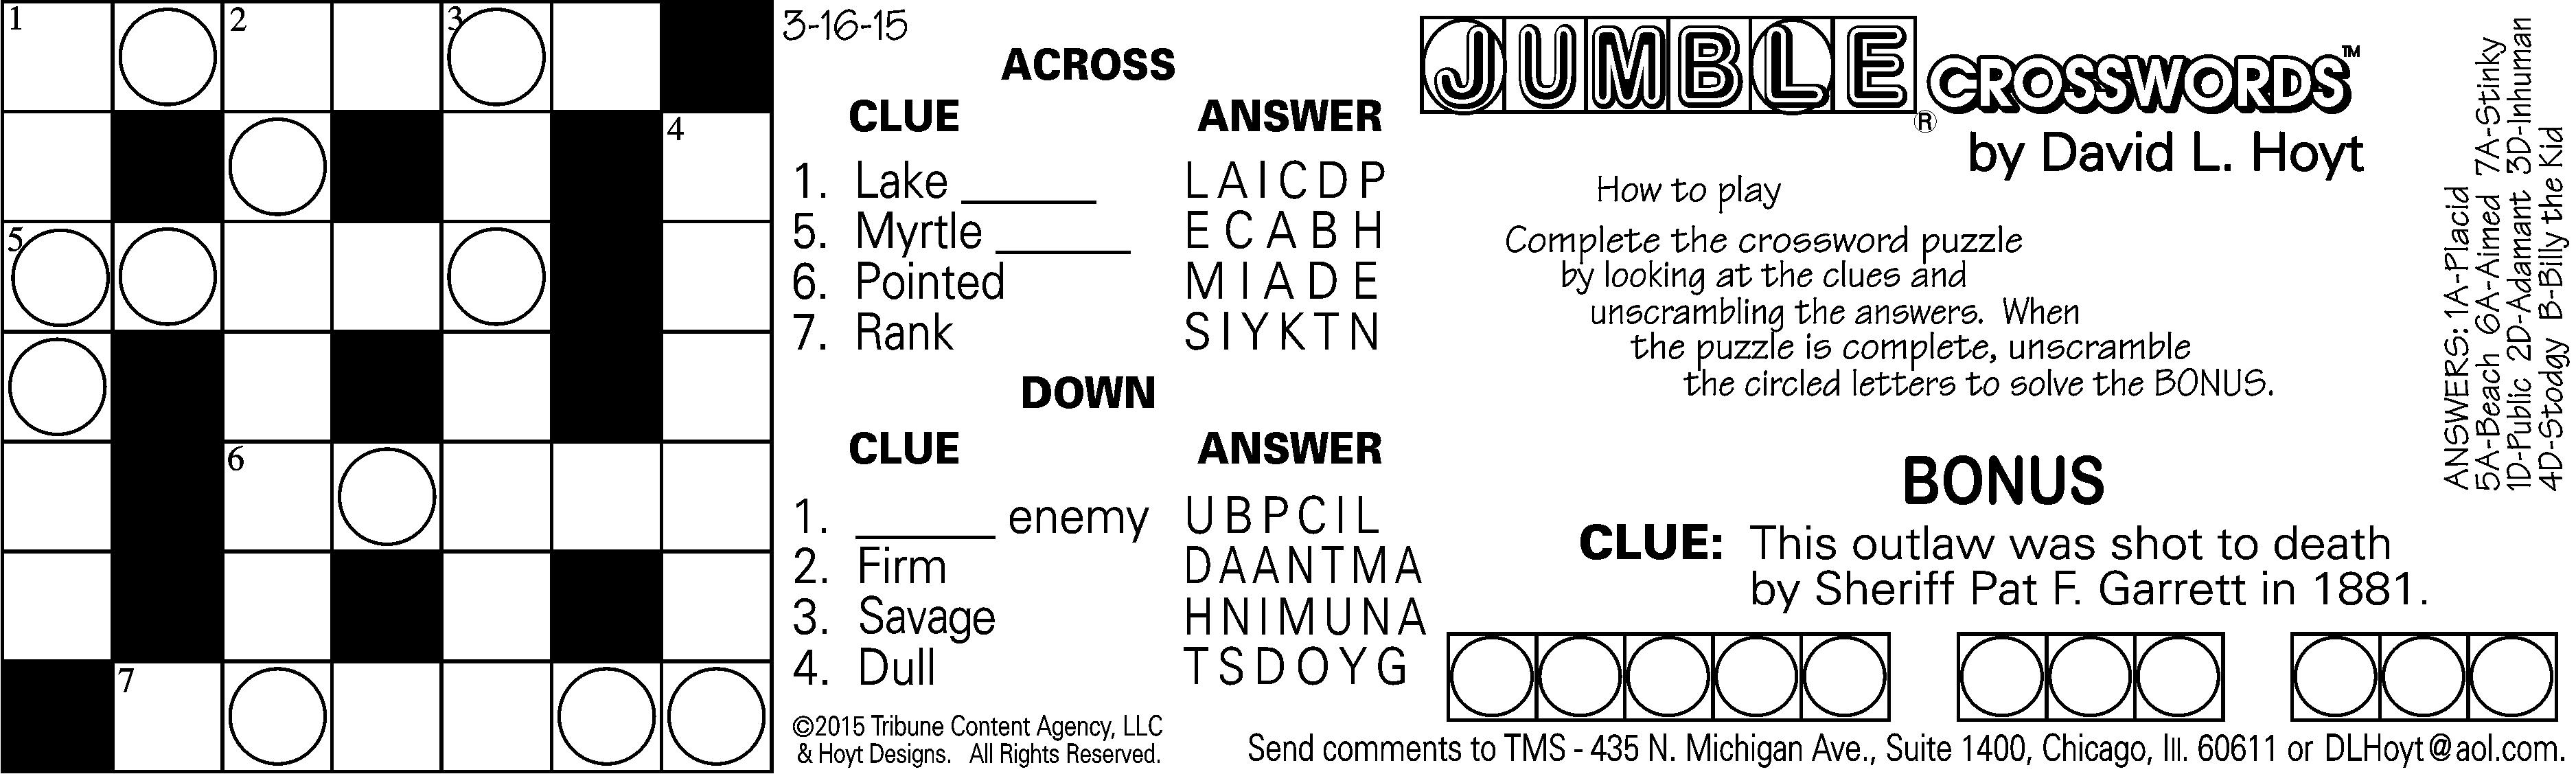 Sample Of Daily Horizontal Jumble Crosswords | Tribune Content - Printable Jumble Crosswords